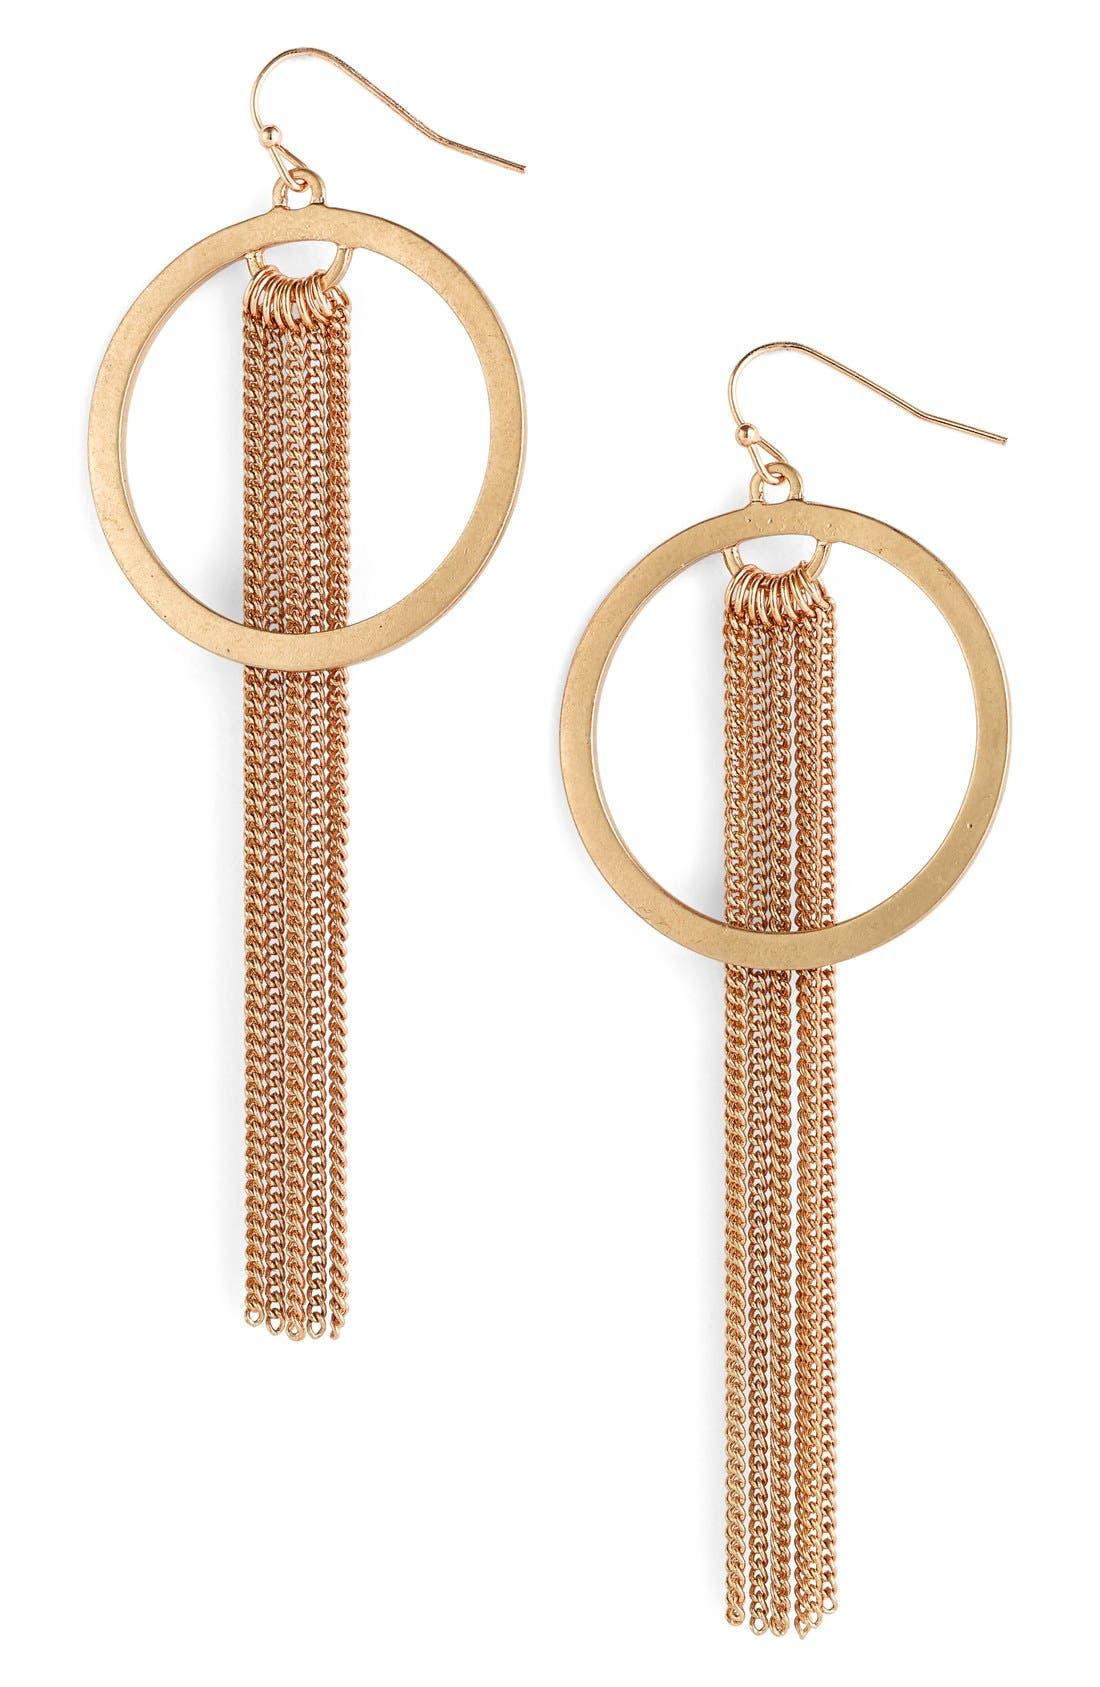 Main Image - BP. Circle Fringe Earrings